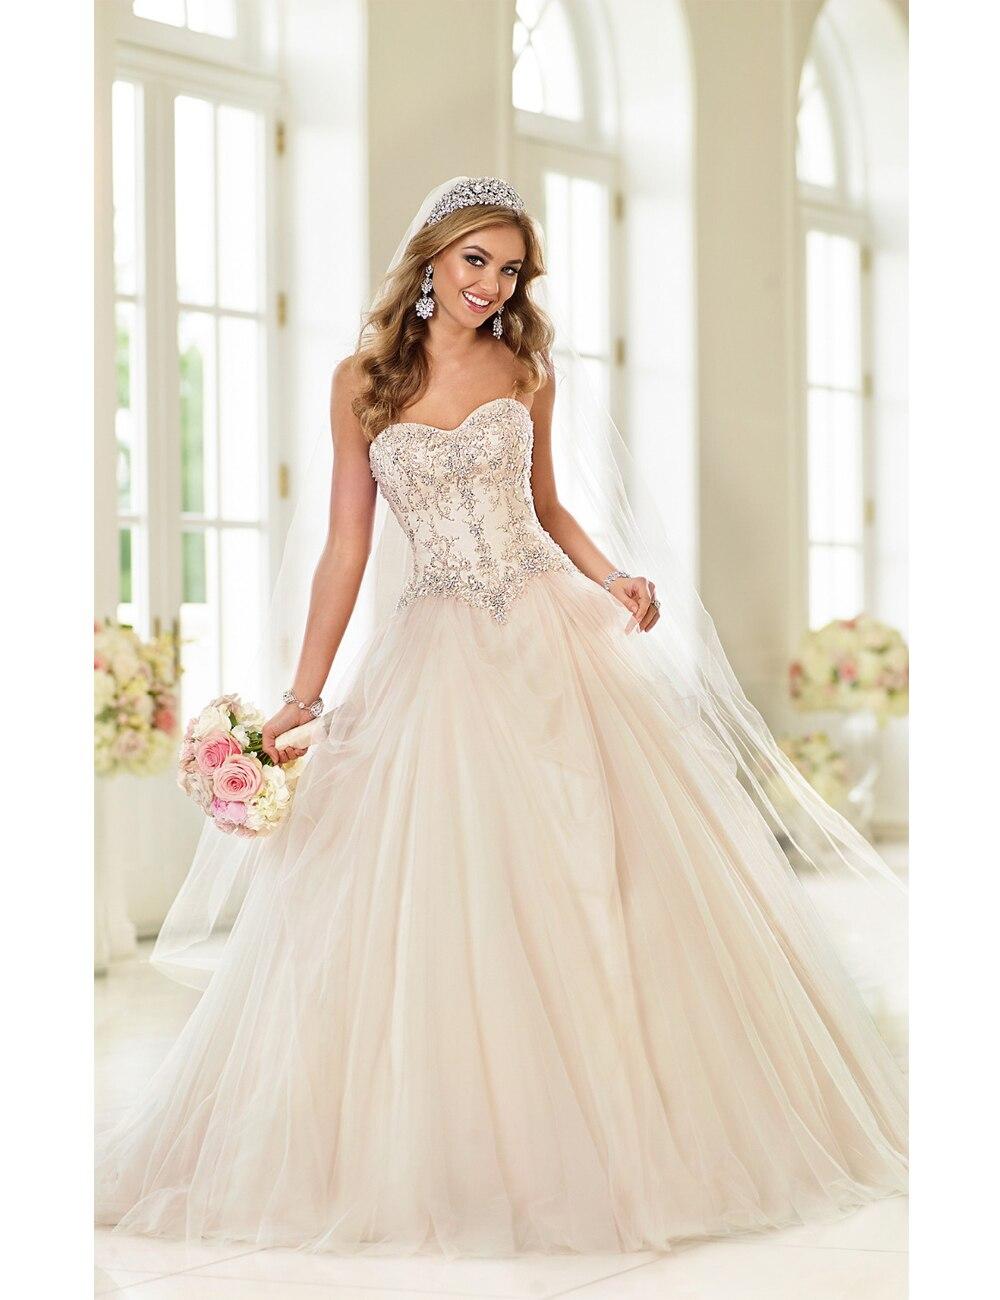 2017 perfect wedding princessdress vestido de noiva a corset closure or a zipper closure under sparkling crystal buttons